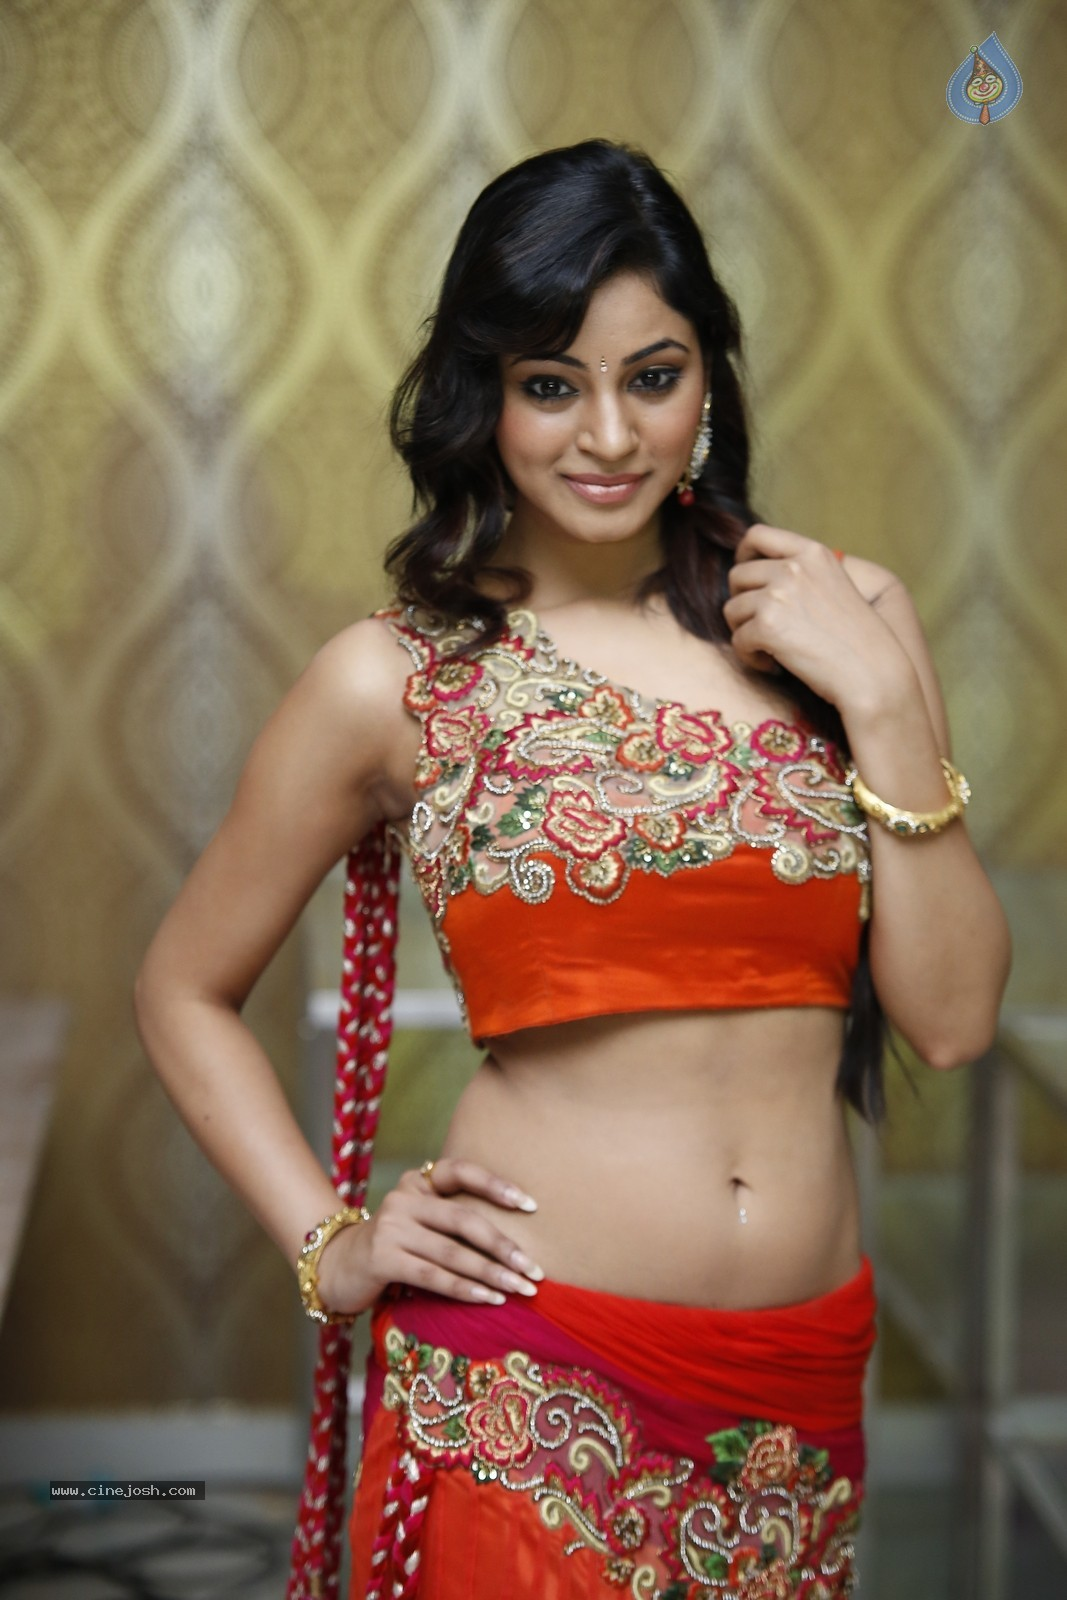 Shilpi Sharma Fashion Show Photos - Actress Album